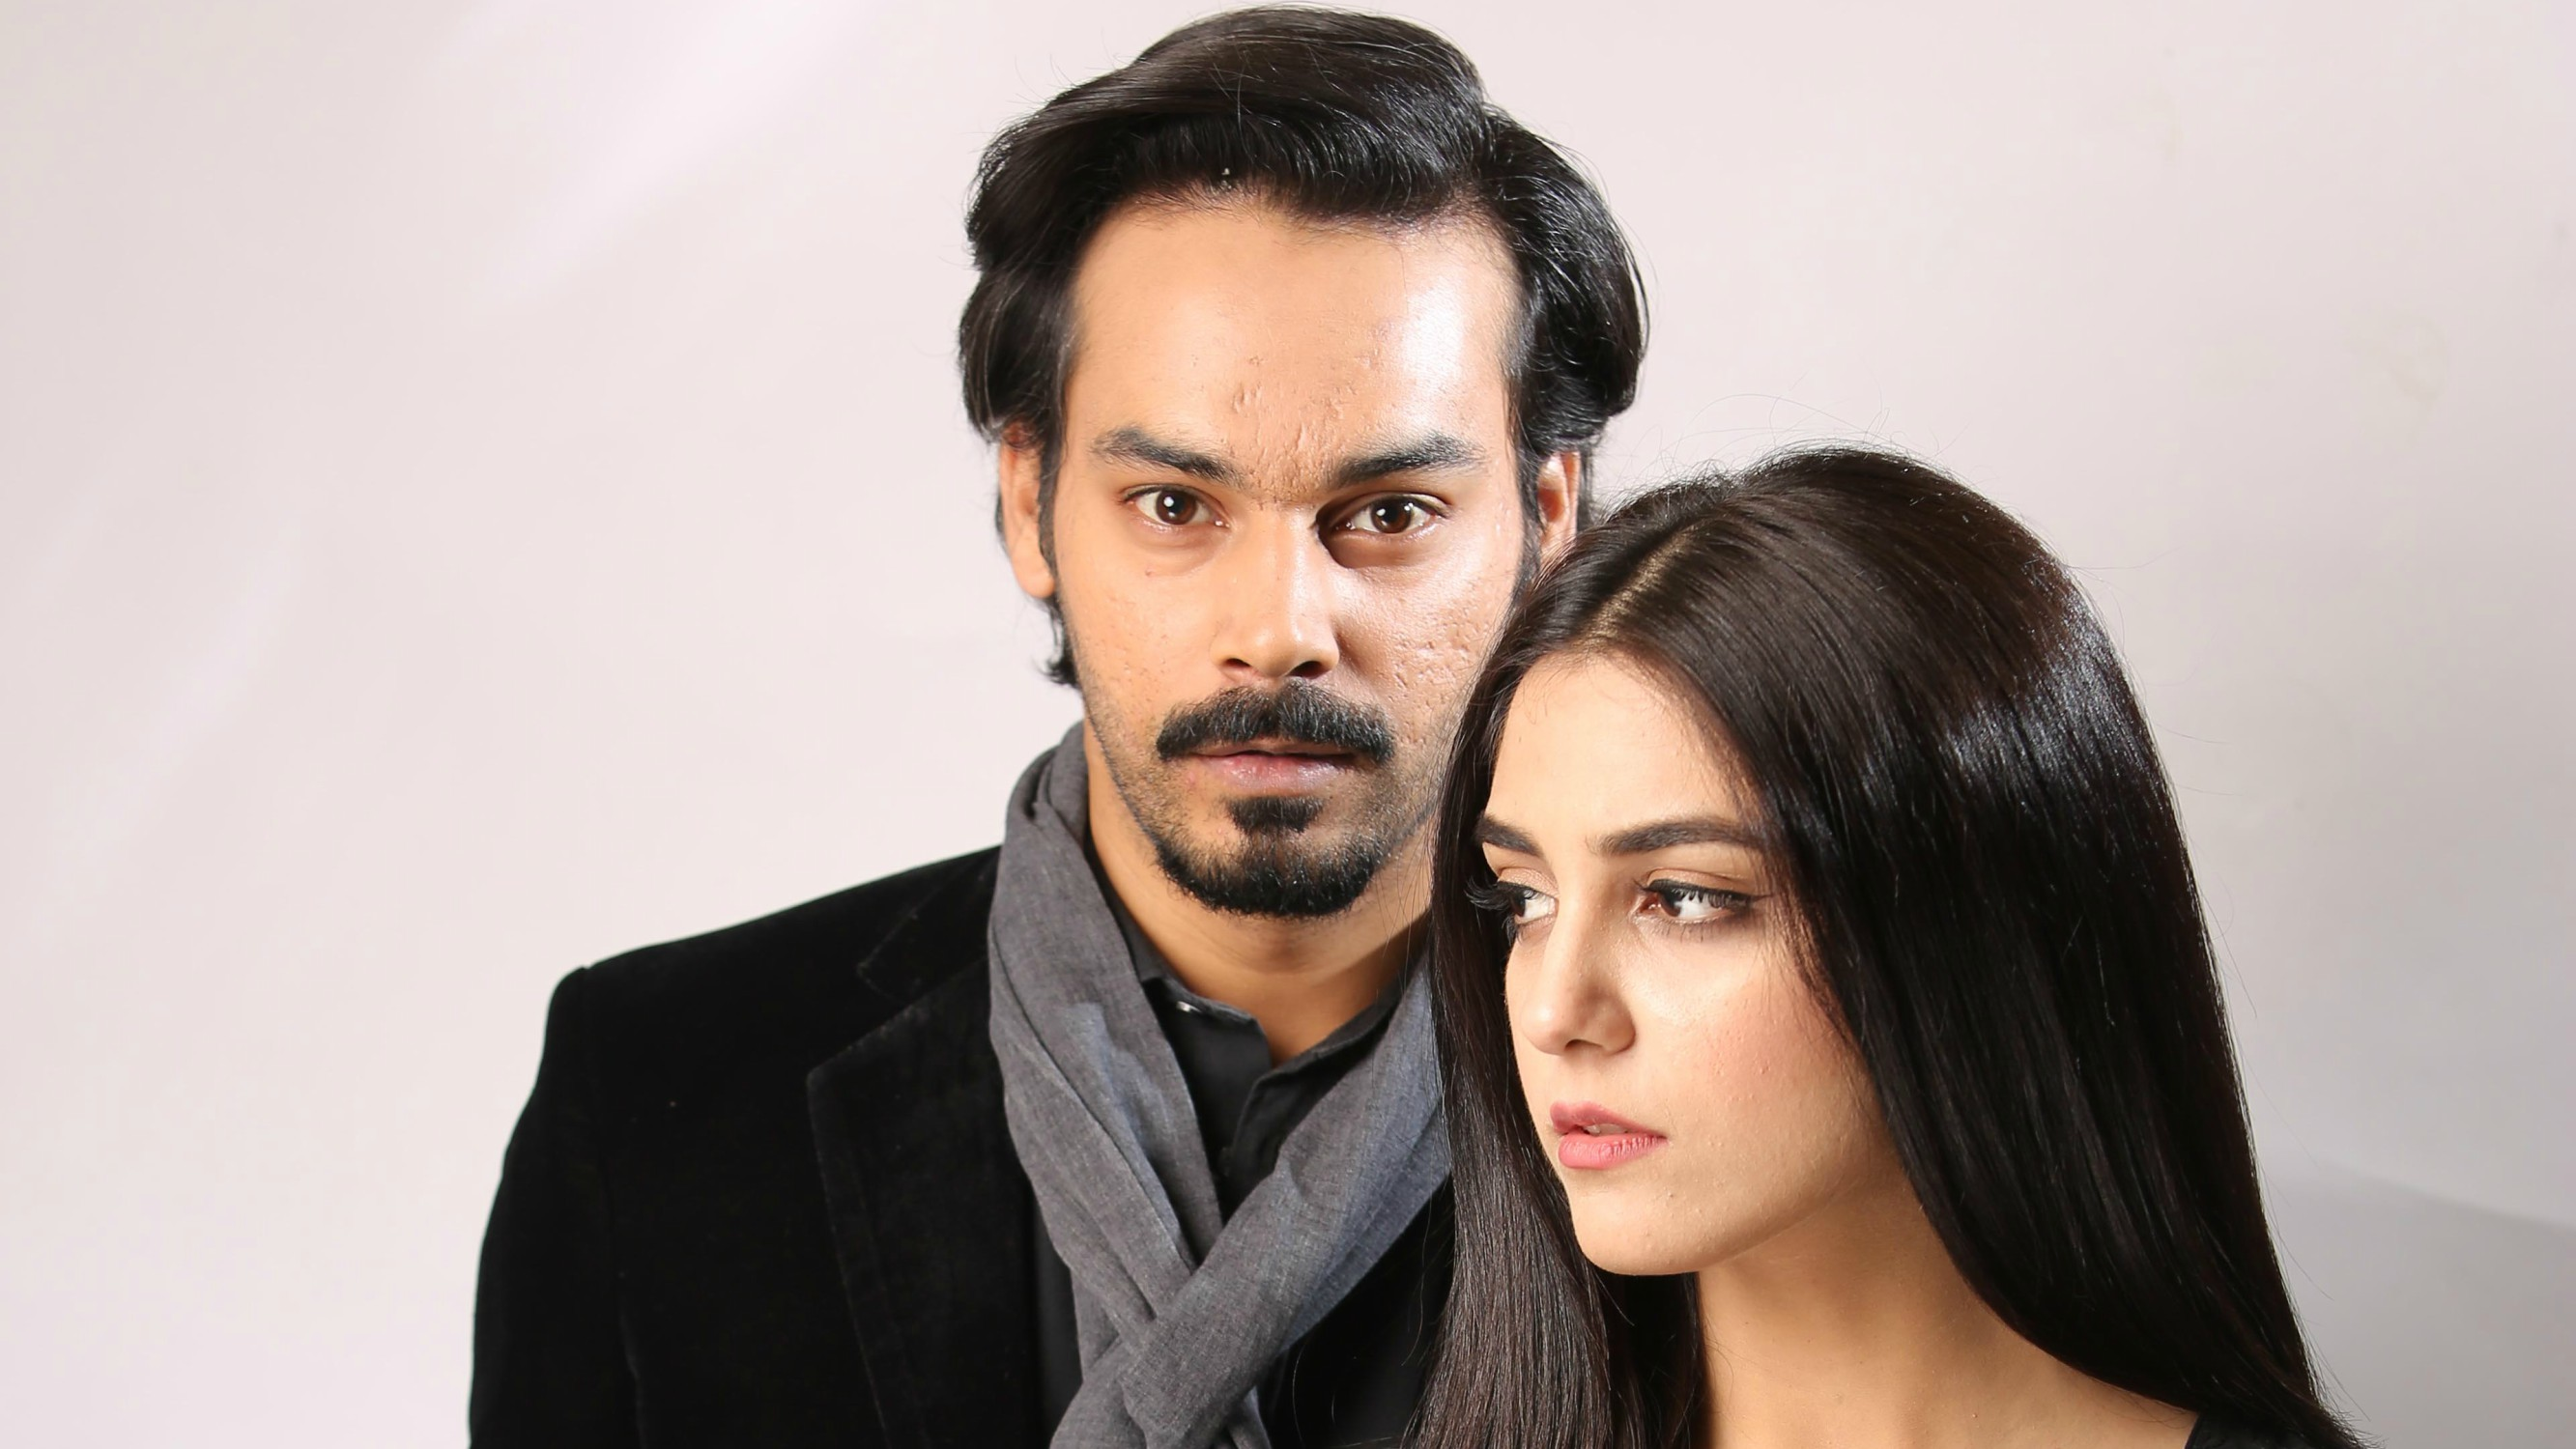 Both Maya Ali and Gohar Rasheed have flip flopped throughout the series